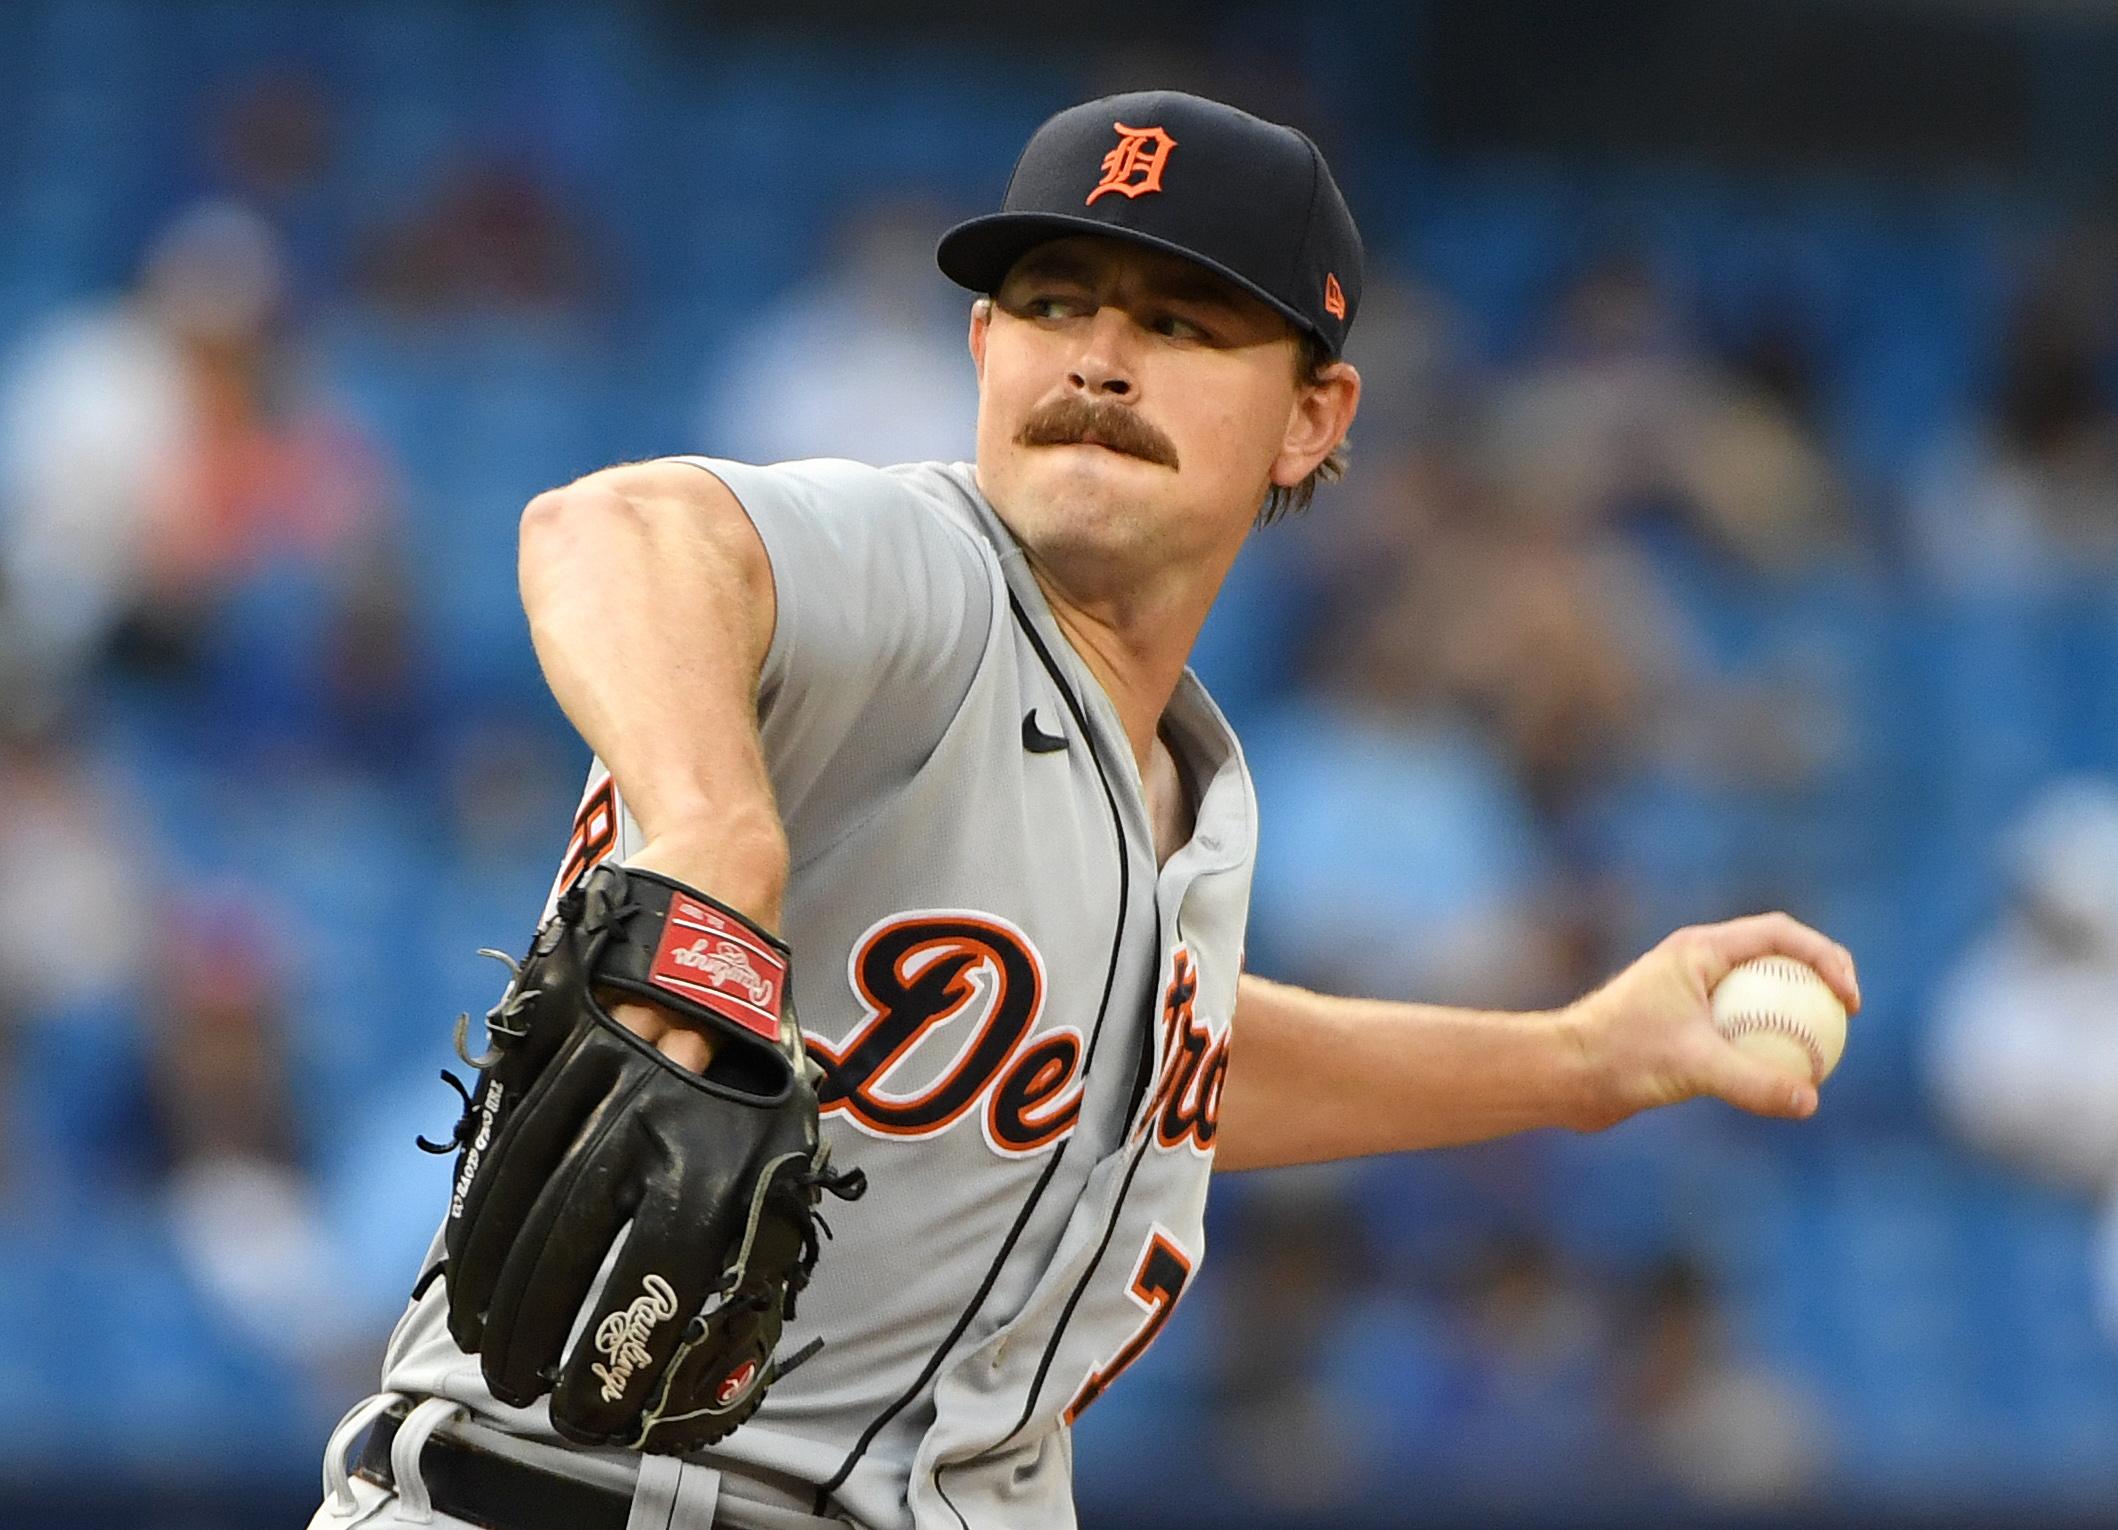 MLB: Detroit Tigers at Toronto Blue Jays